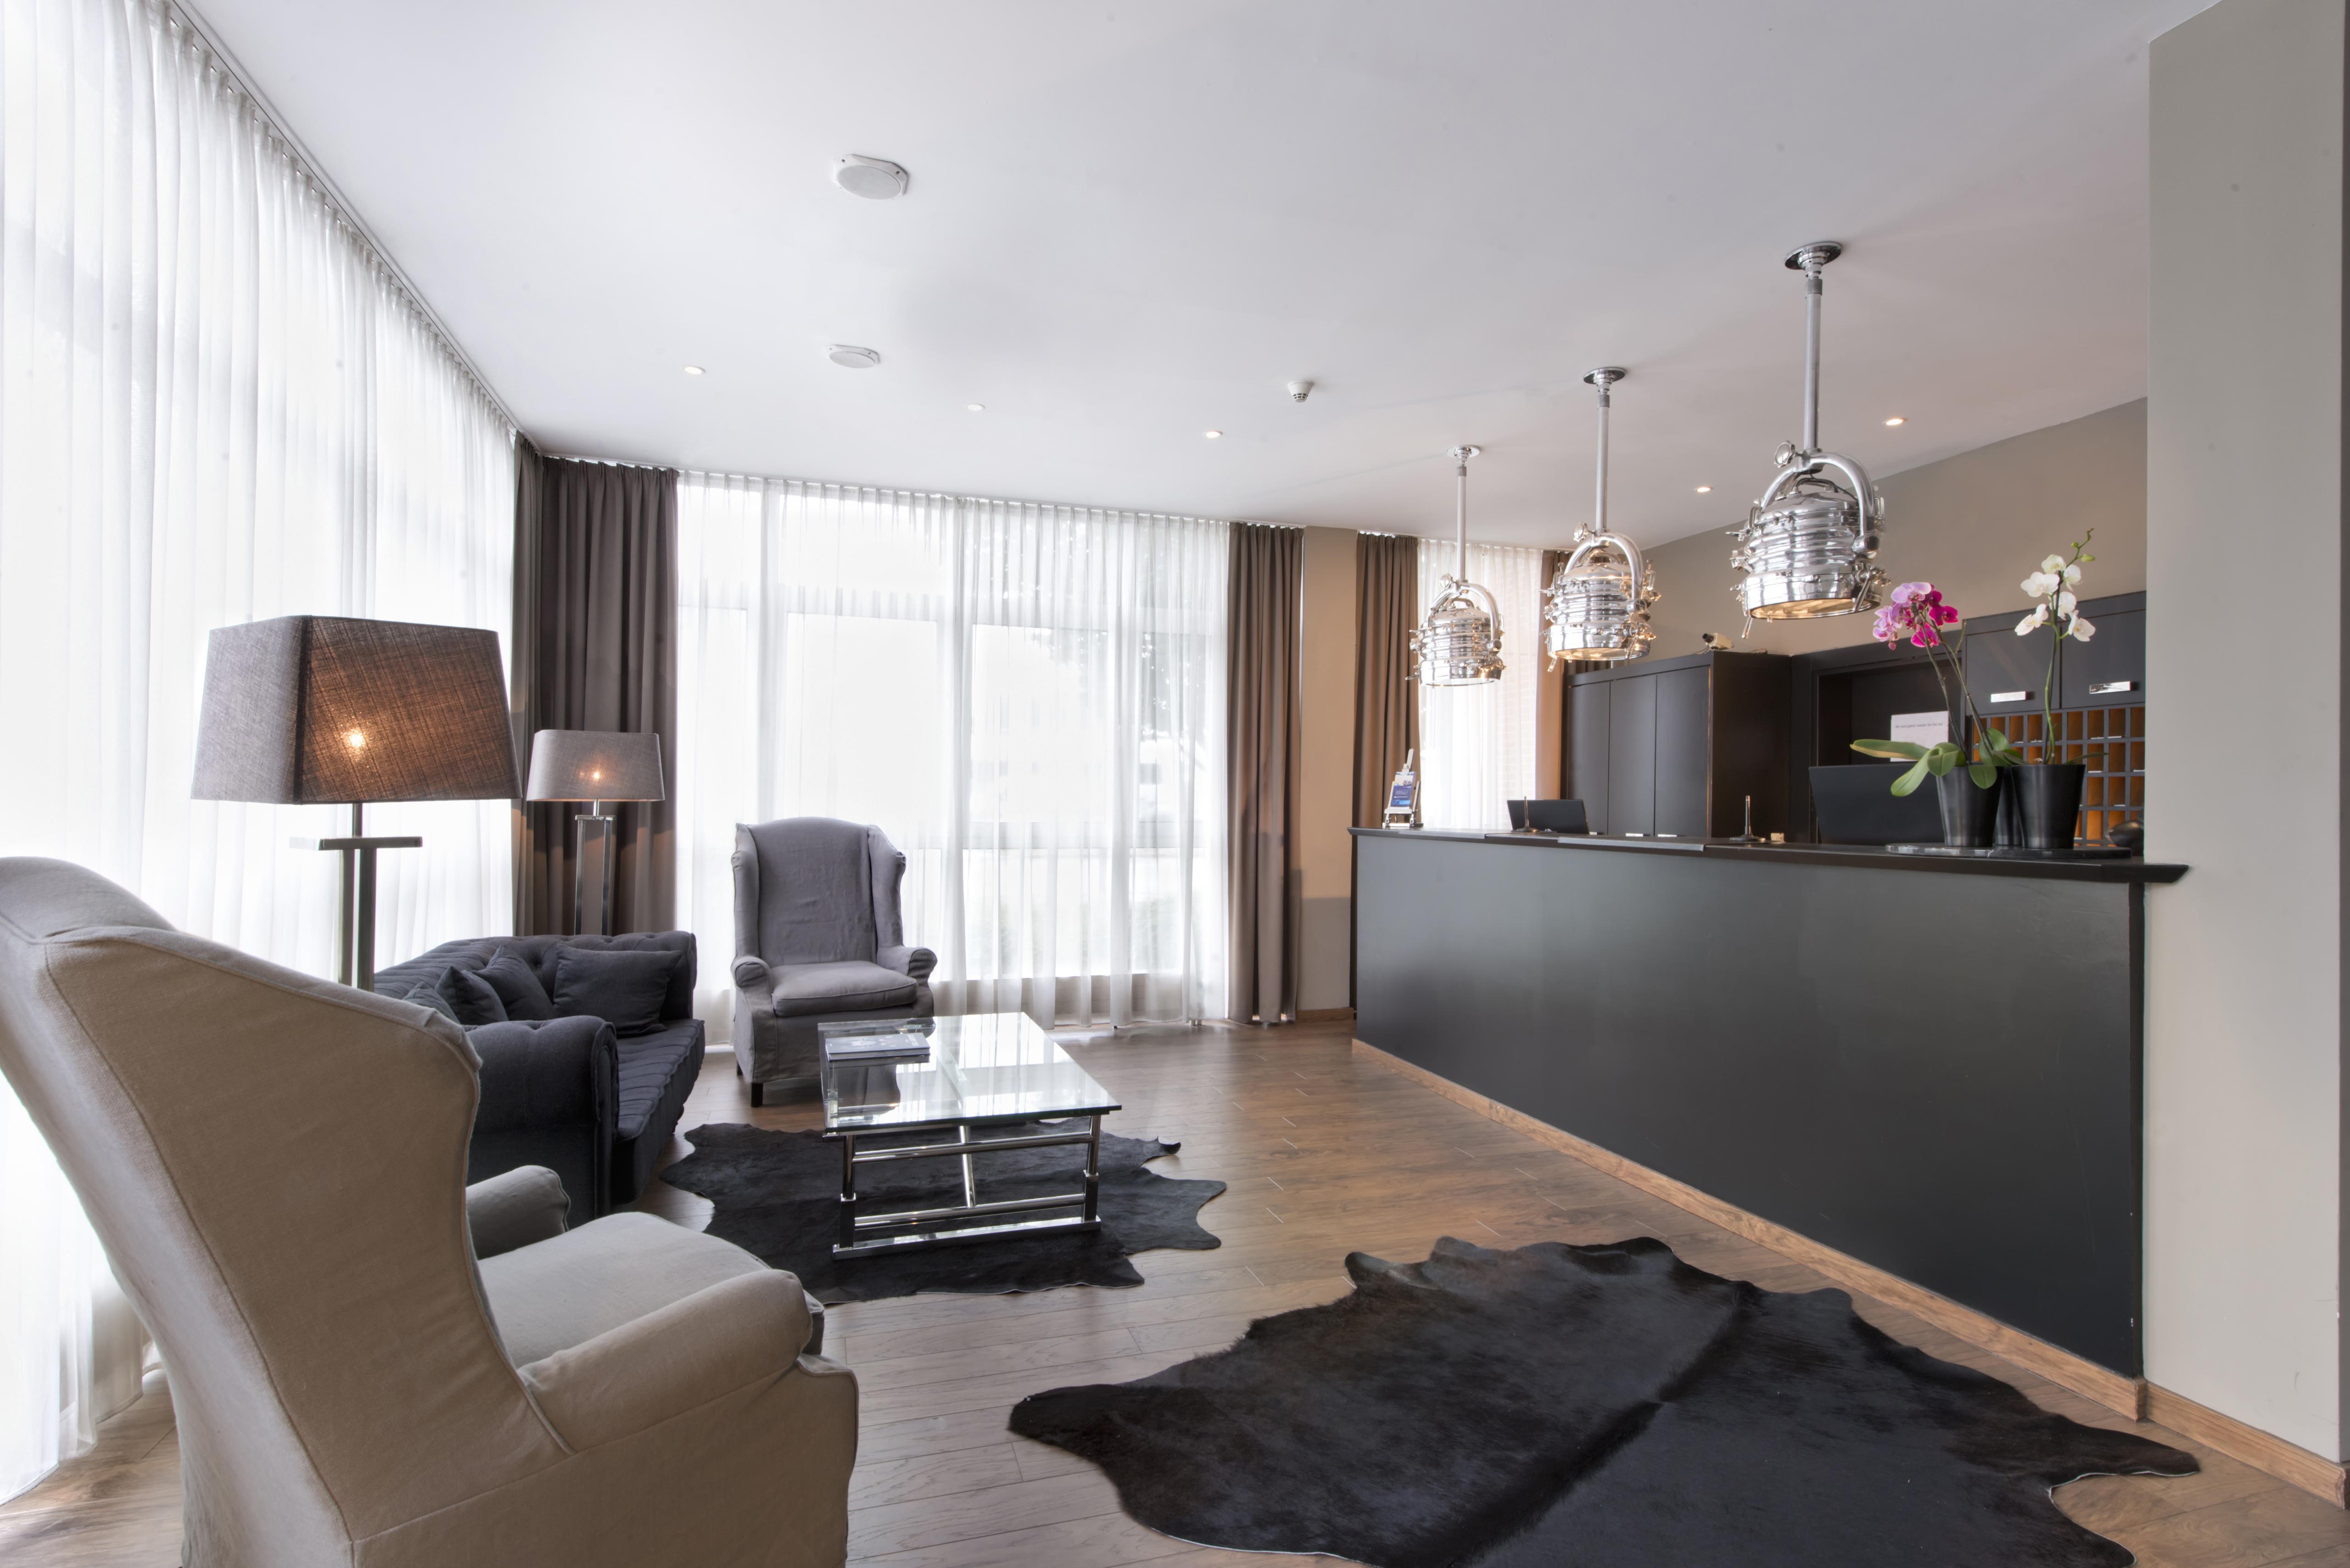 tryp by wyndham bremen airport reise tipps bremen. Black Bedroom Furniture Sets. Home Design Ideas